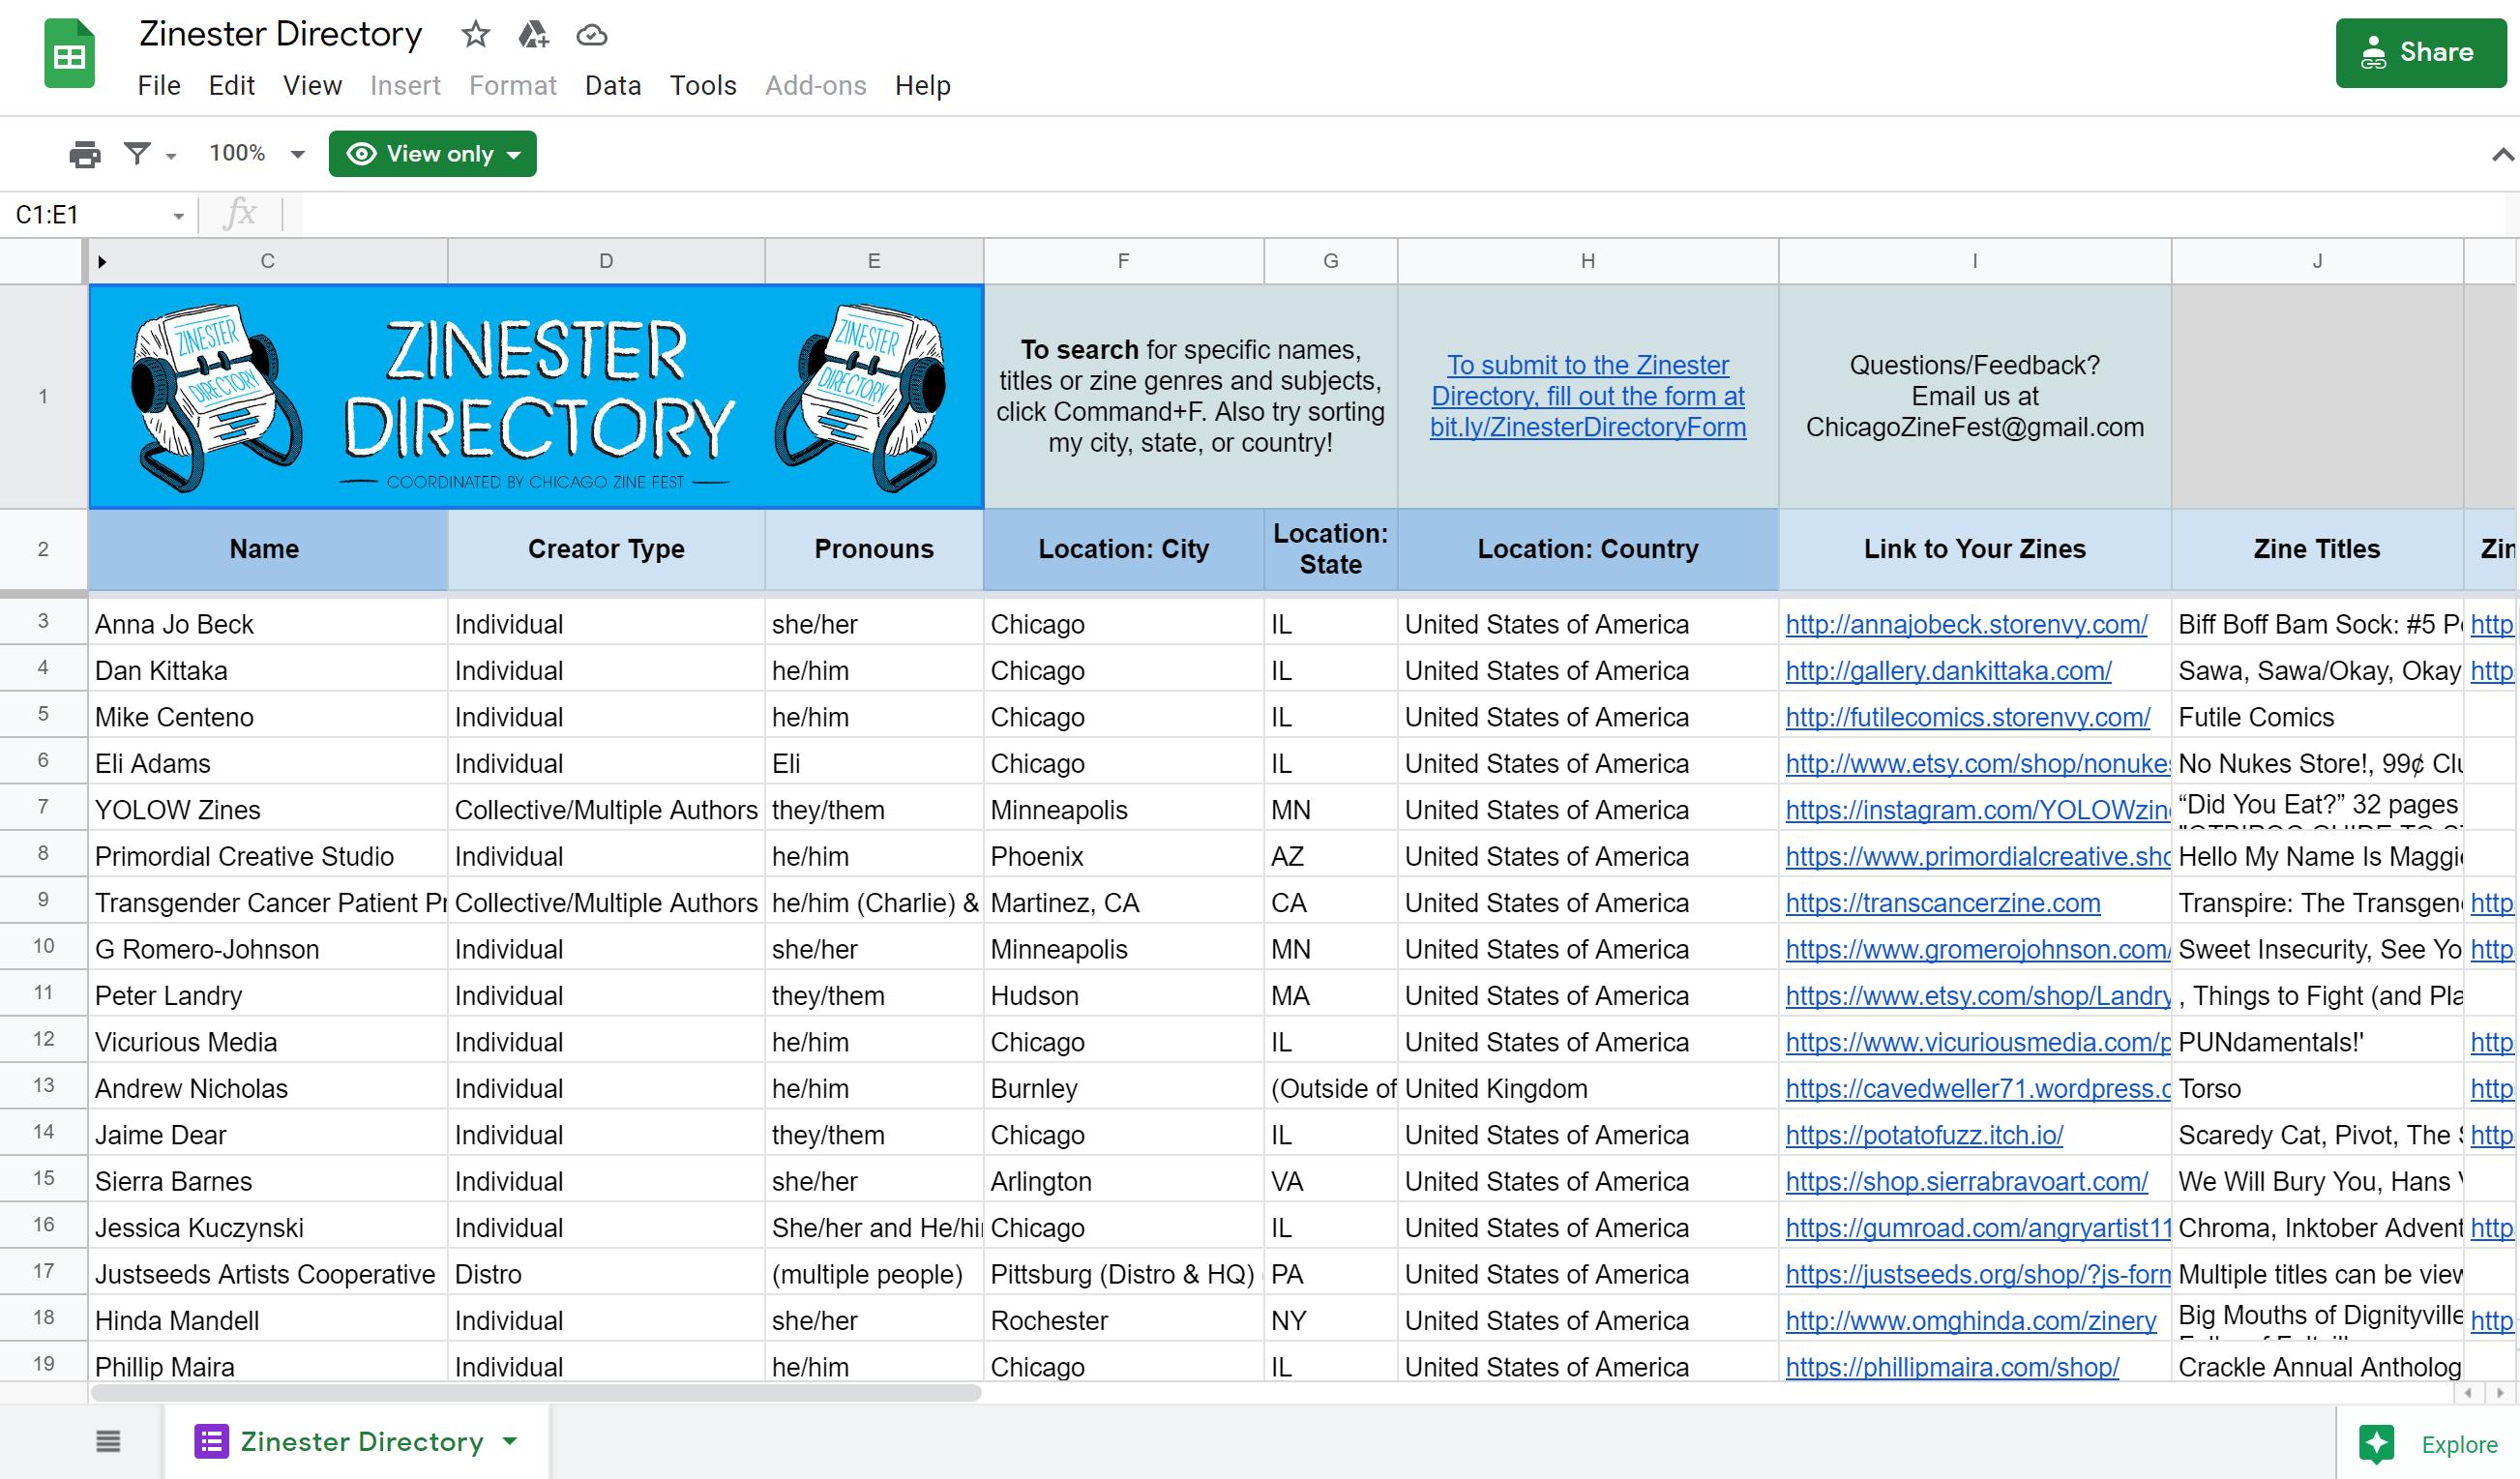 screenshot of the google spreadsheet